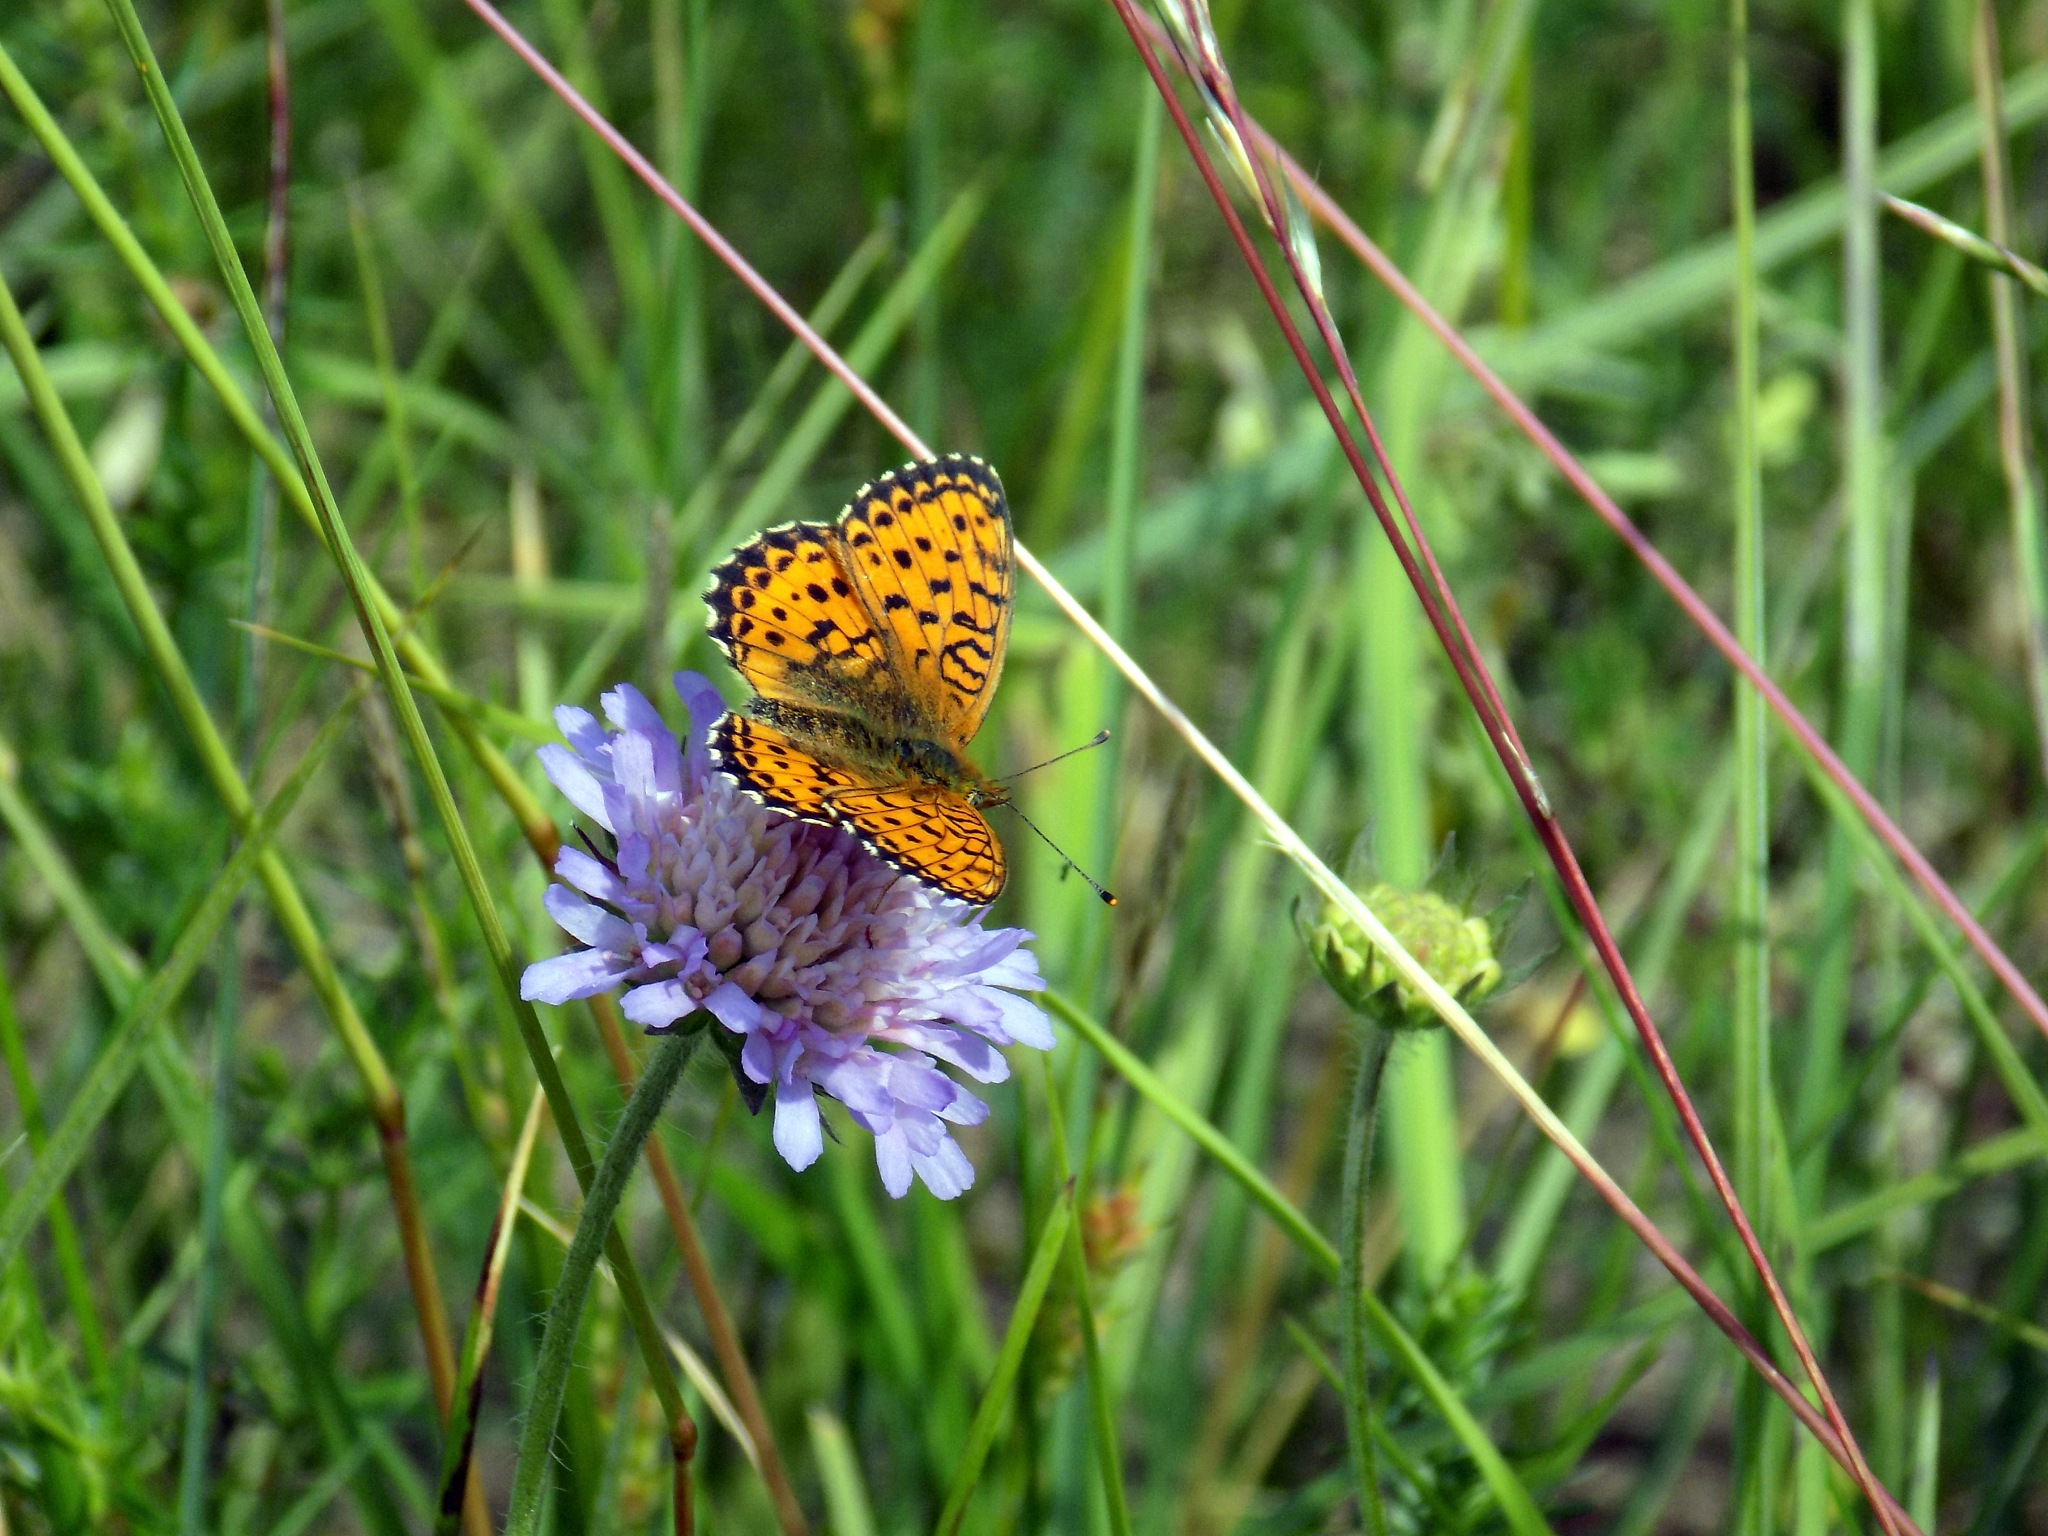 Butterfly by uzkuraitiene62